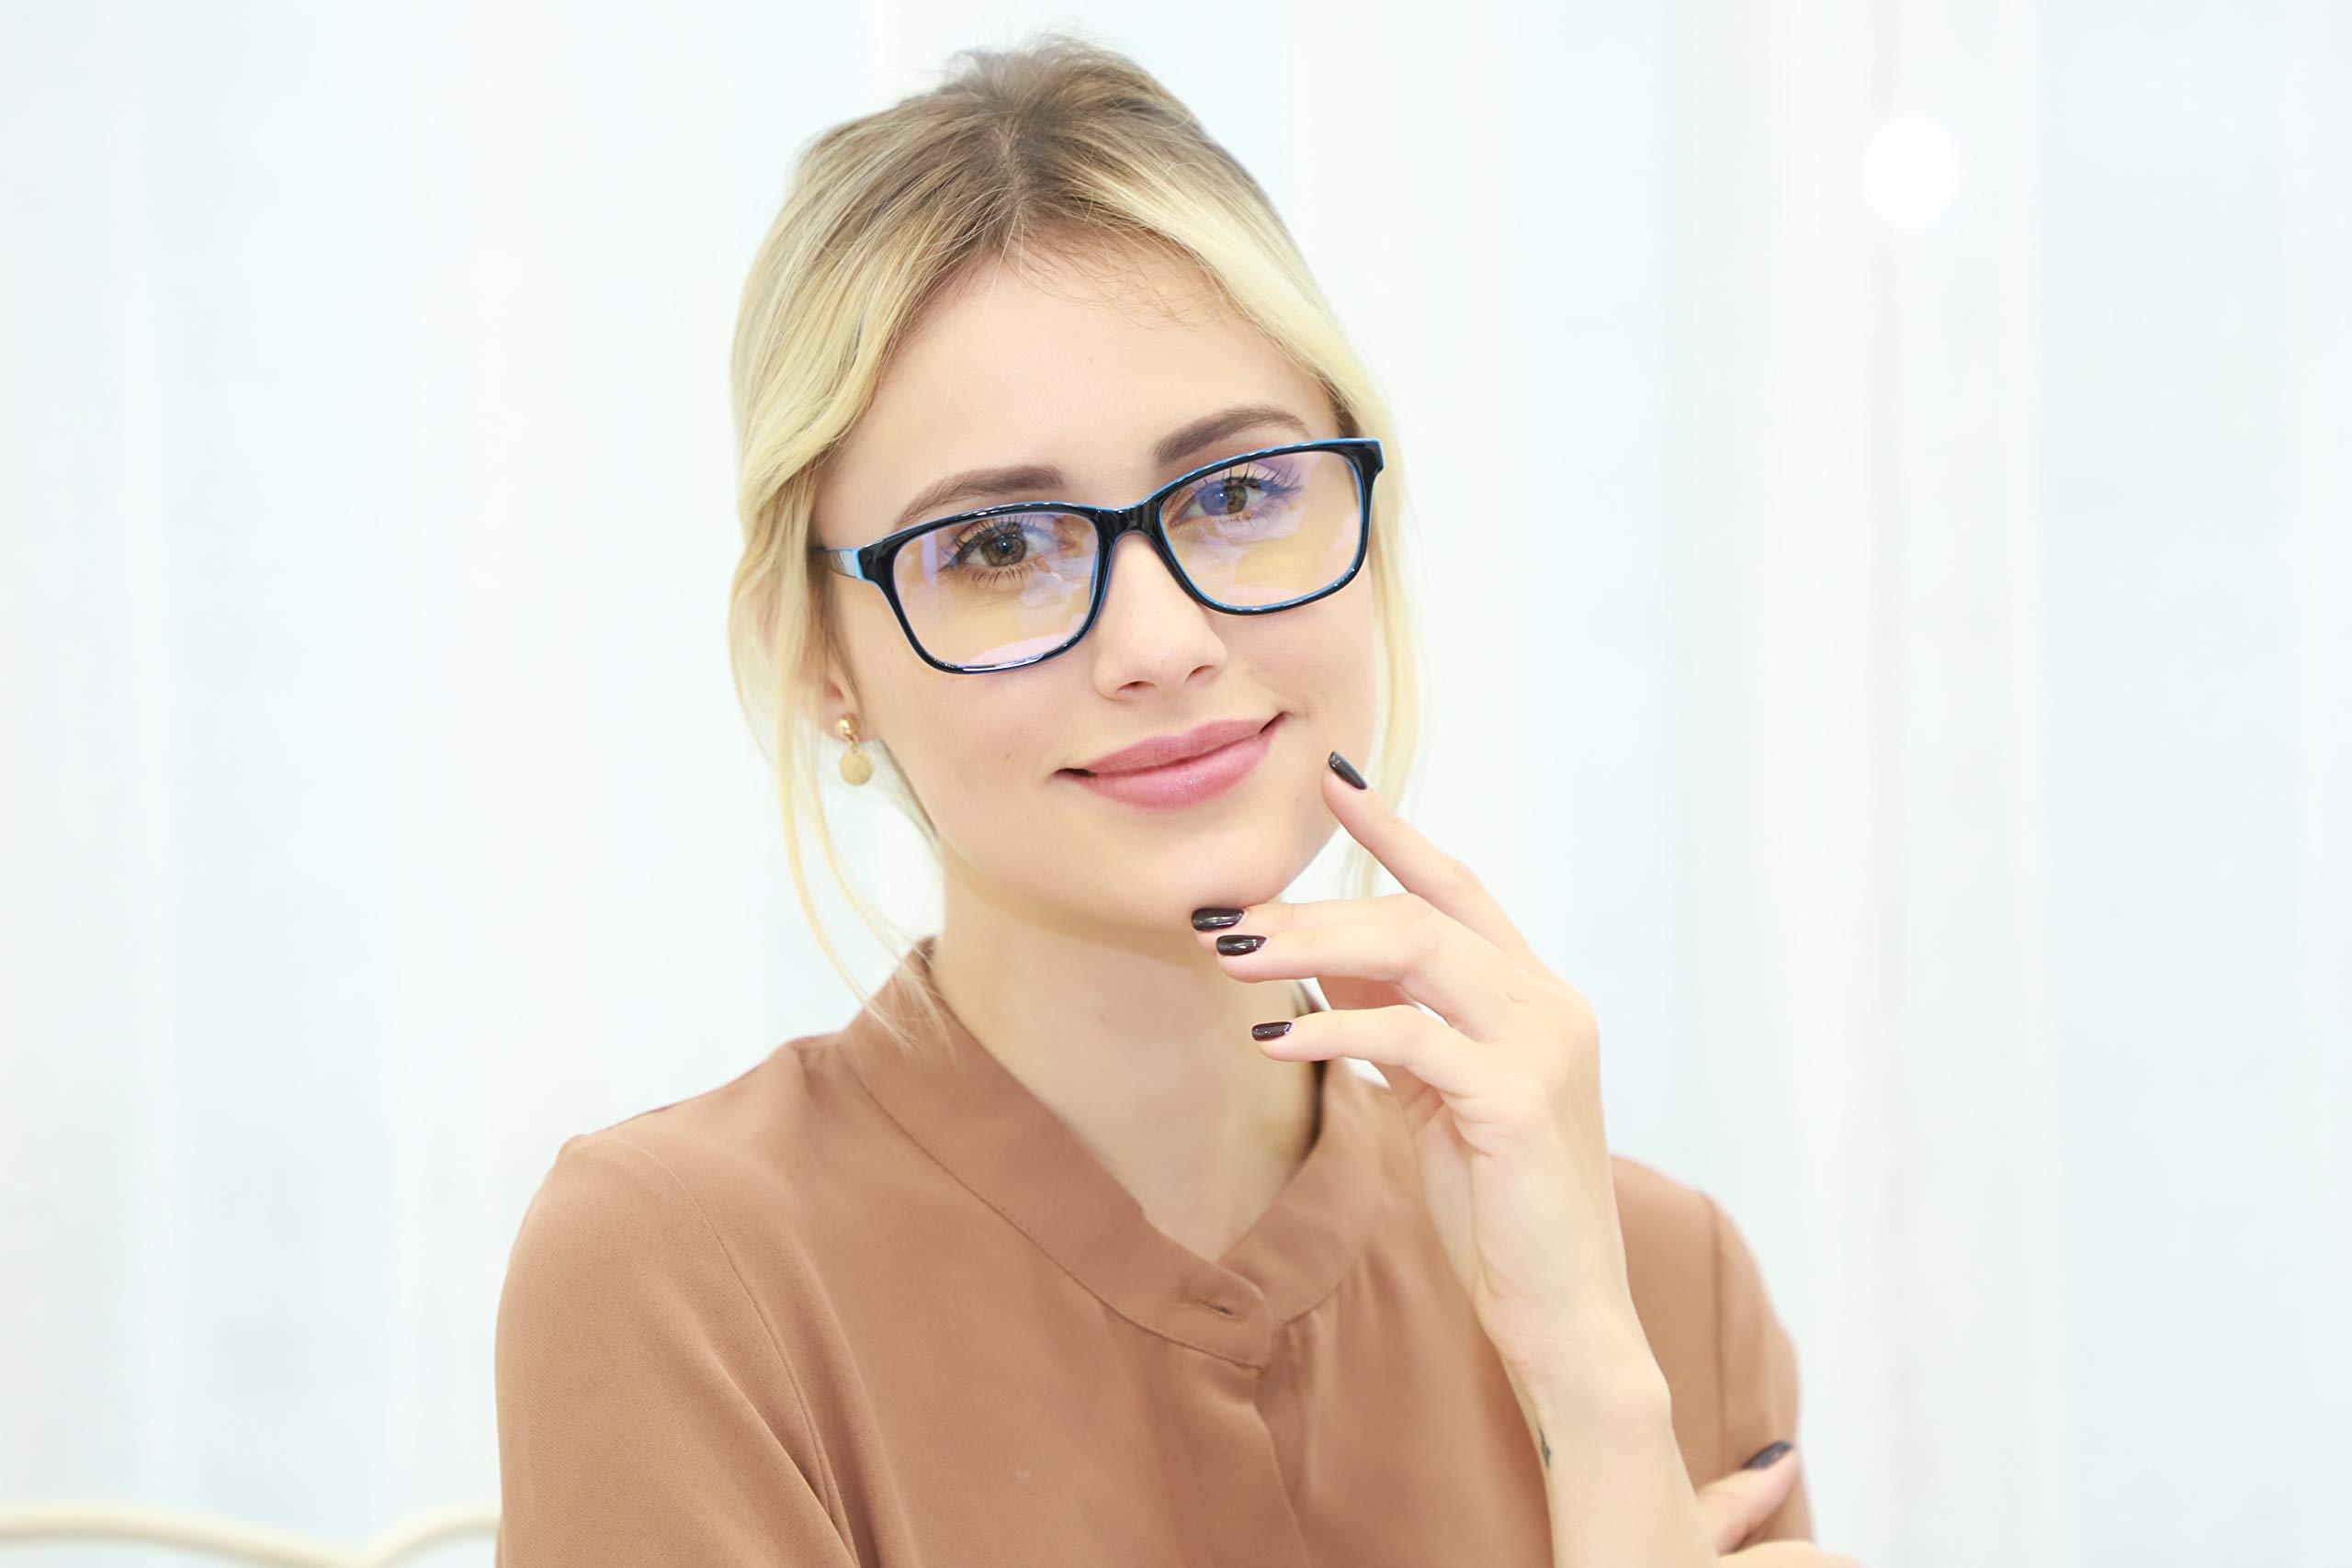 K KENZHOU Blue Light Blocking Computer Glasses 2 Pack Anti Eye Eyestrain Unisex(Men/Women) Glasses with Spring Hinges UV Protection Twilight and Blue by K KENZHOU (Image #6)